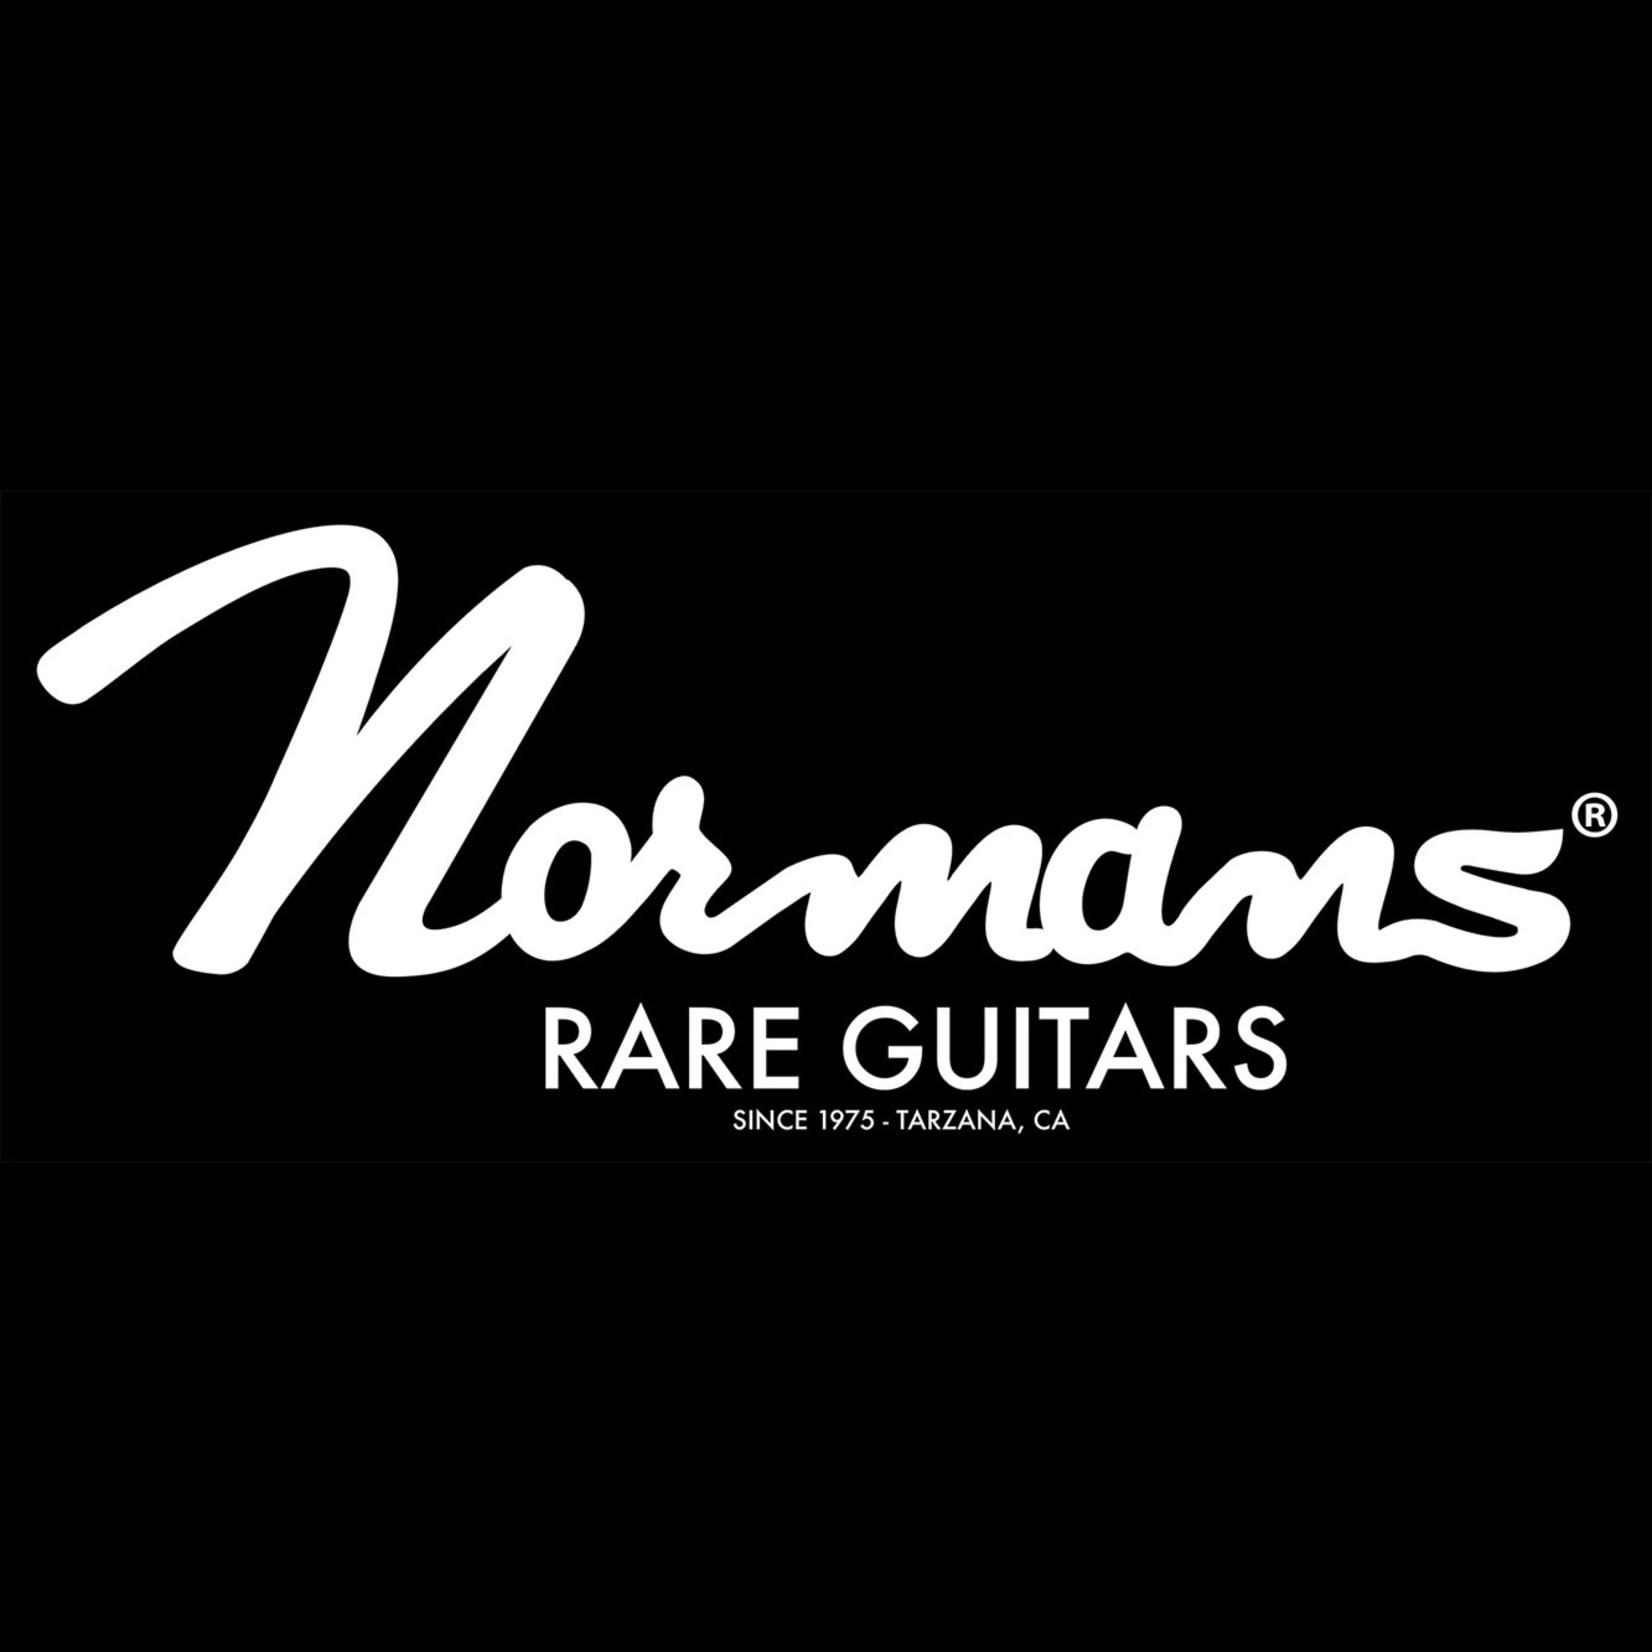 Norman's Rare Guitars Limited Edition - NRG Spaghetti Logo T-Shirt